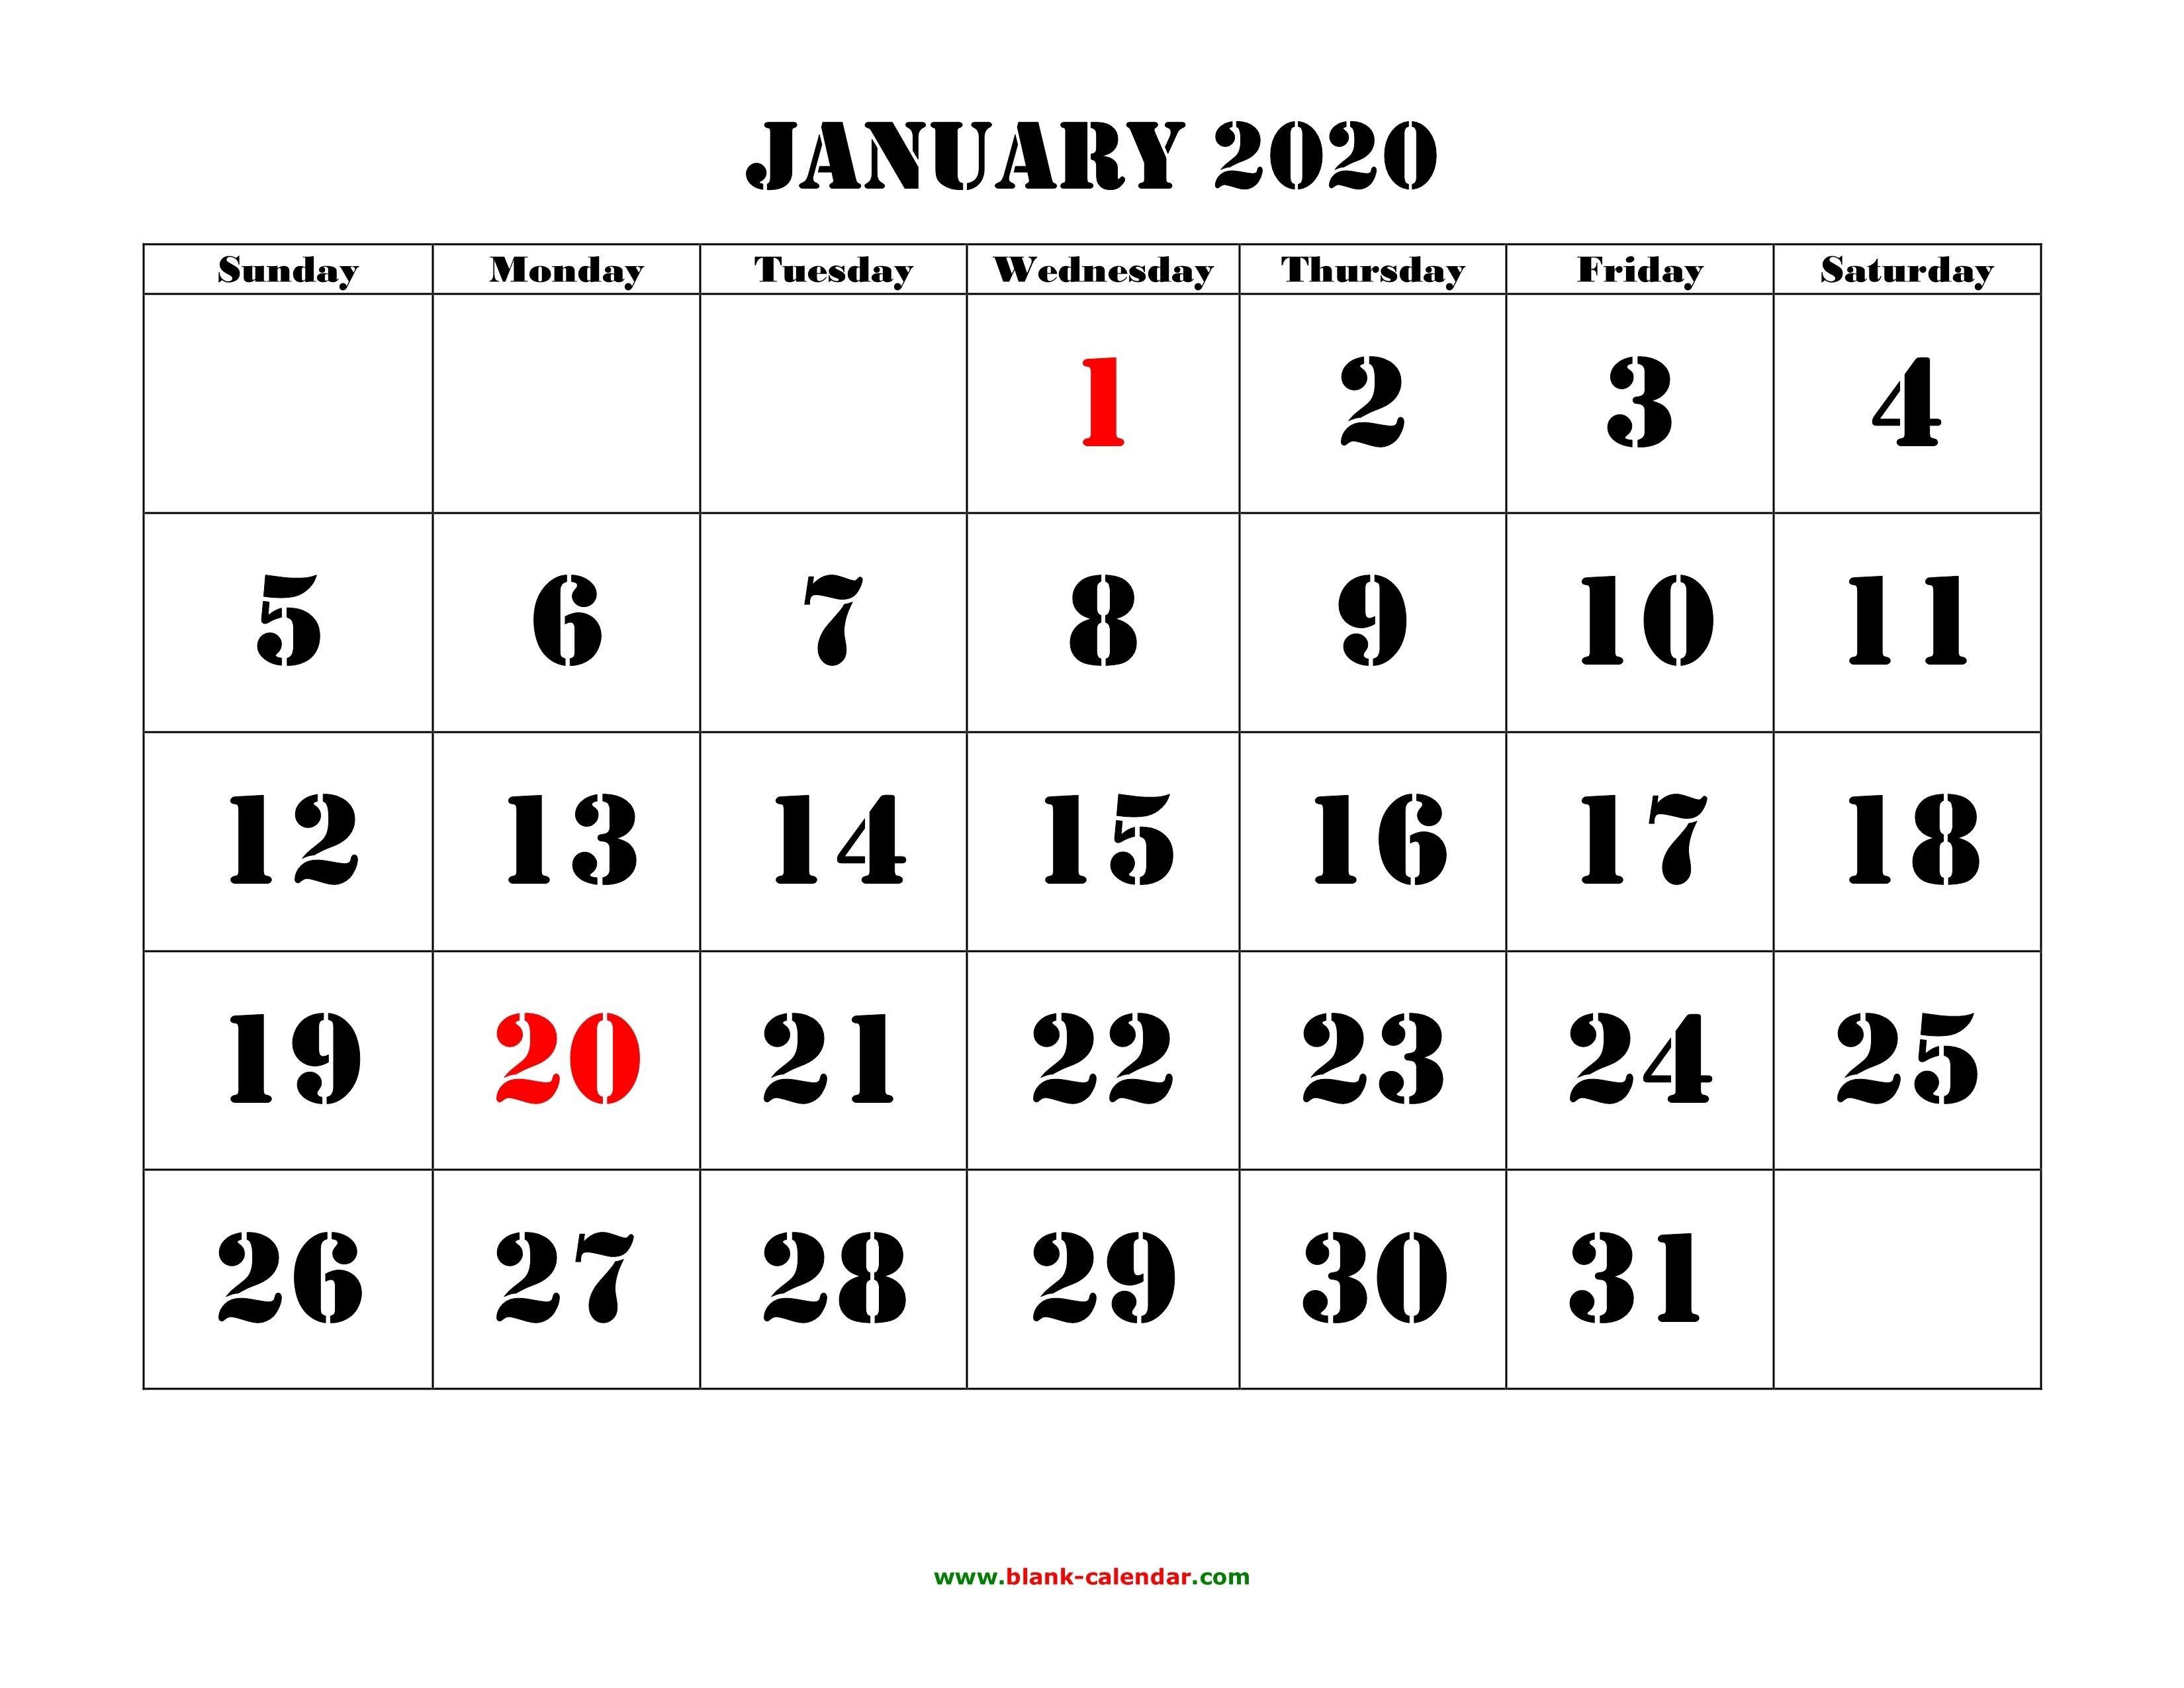 2020 January Calendar #january #january2020-January 2020 Vertical Calendar